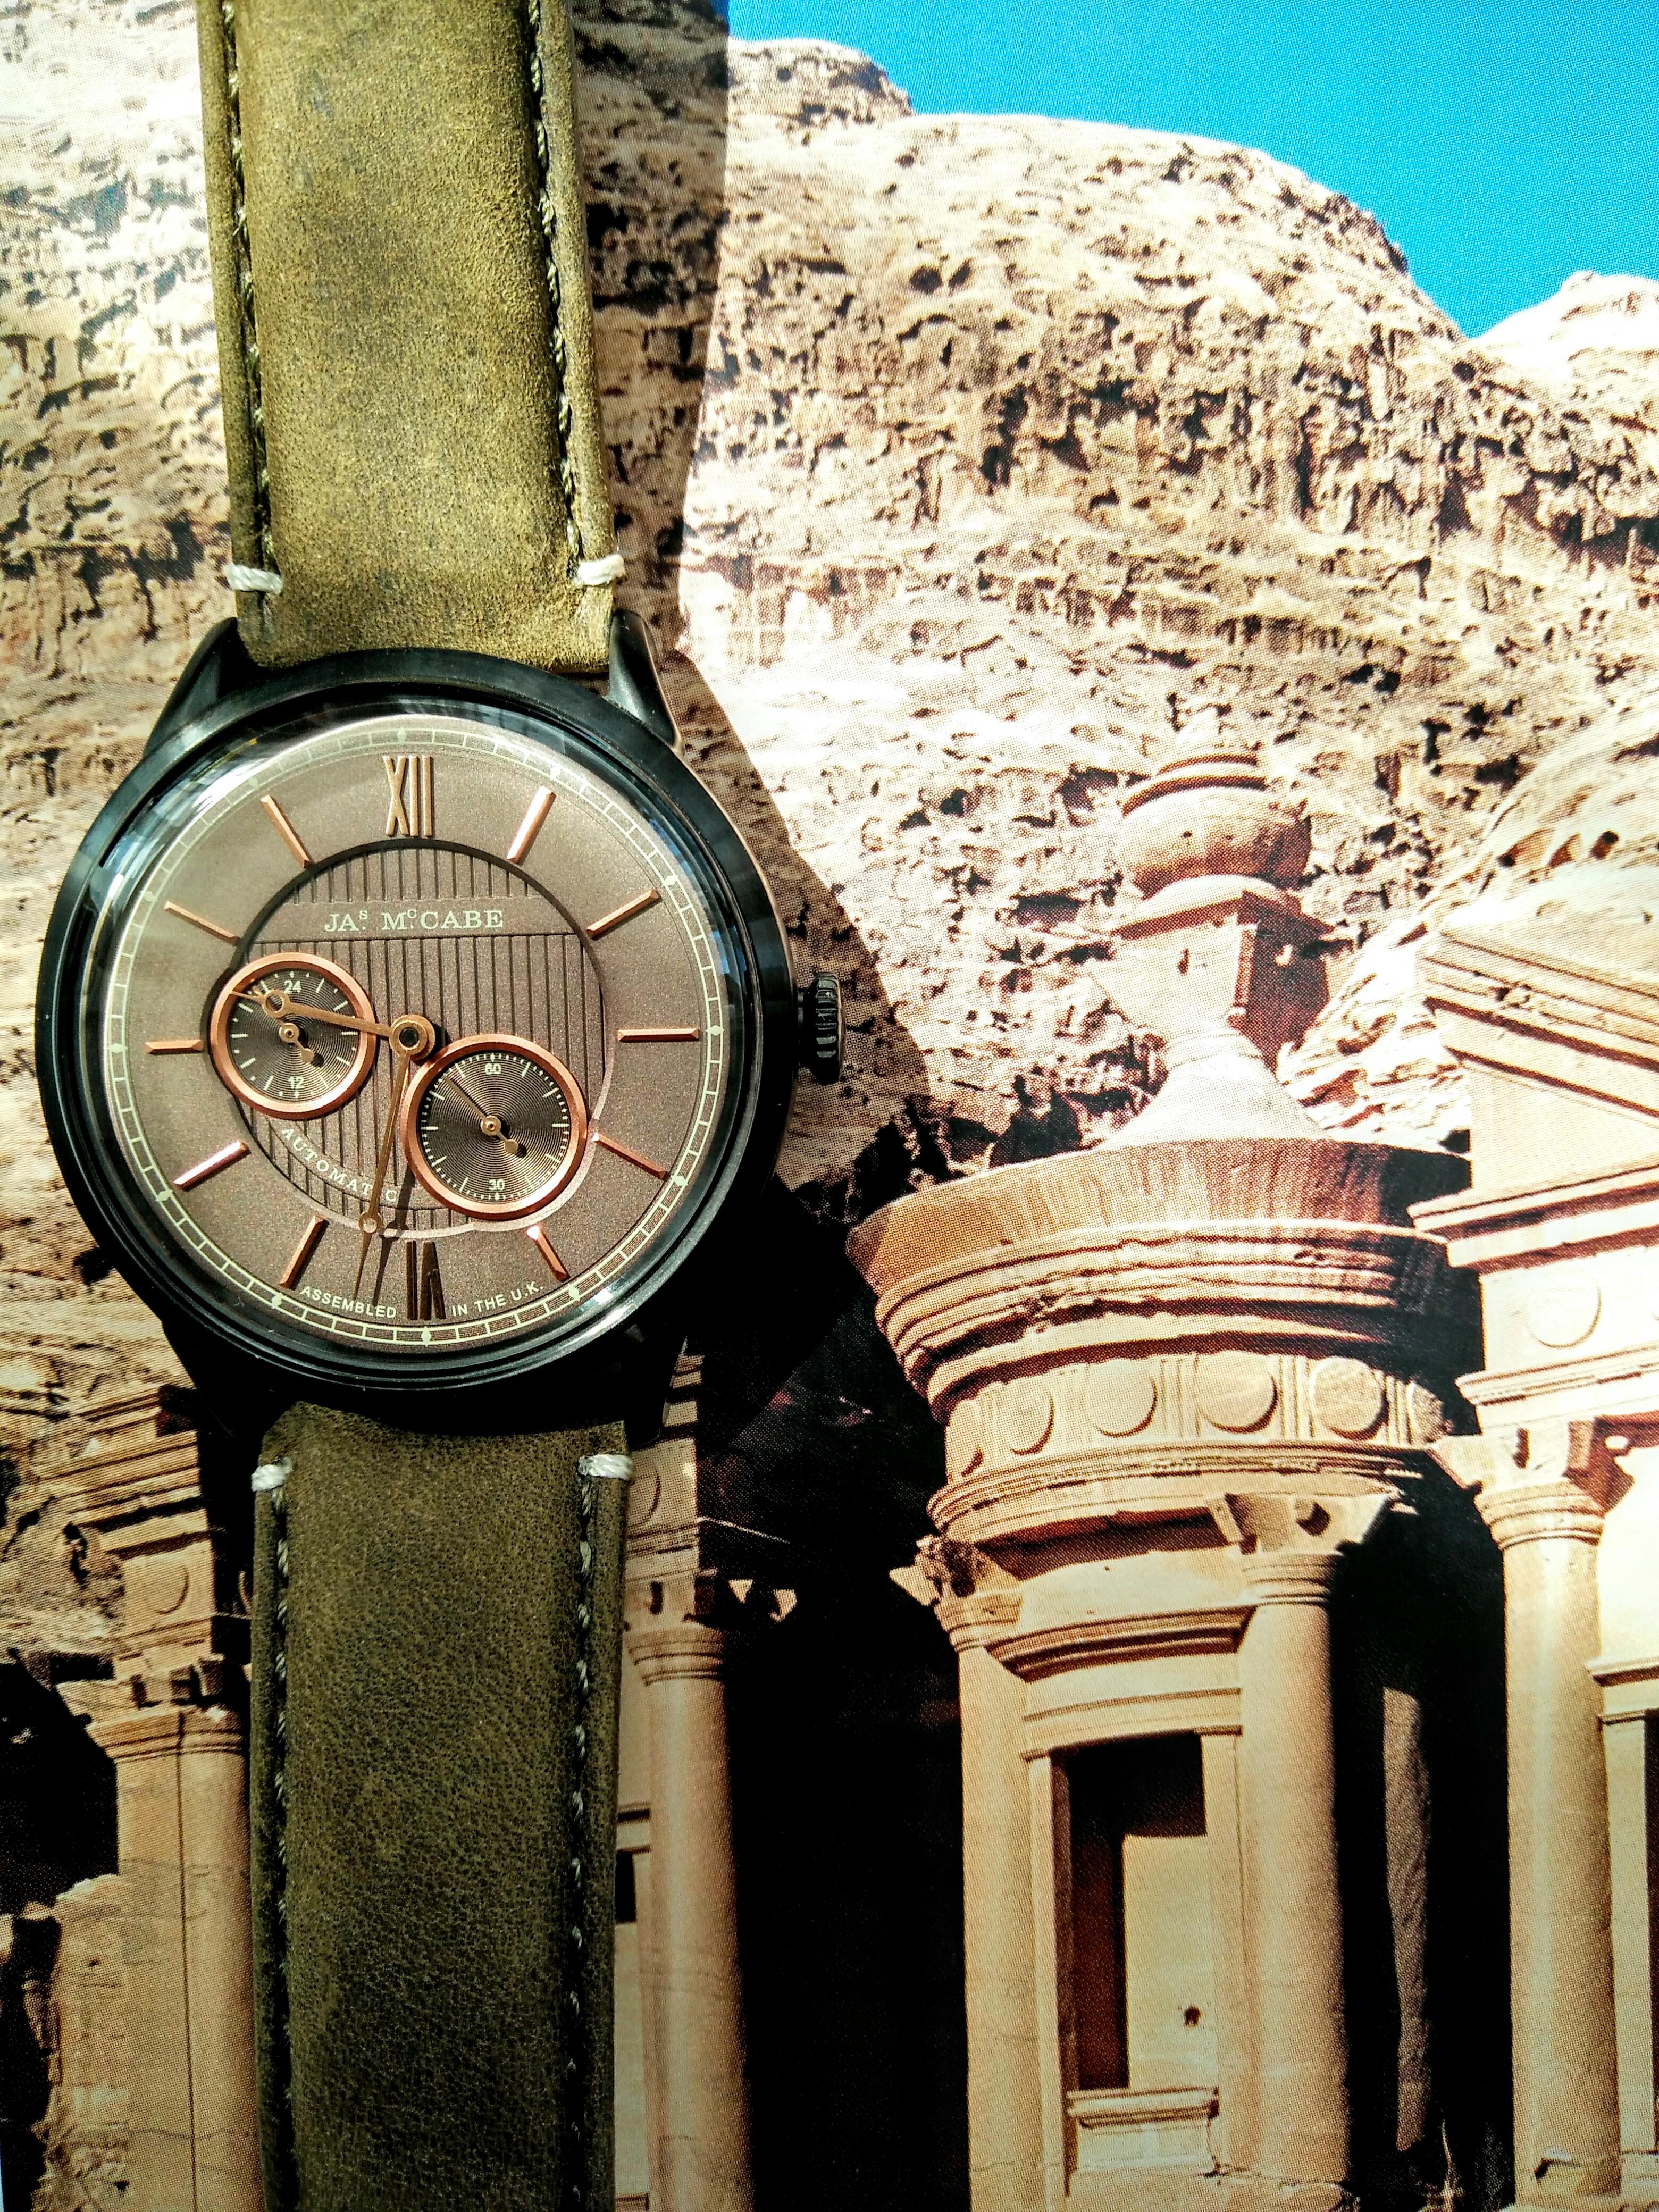 James McCabe Watches